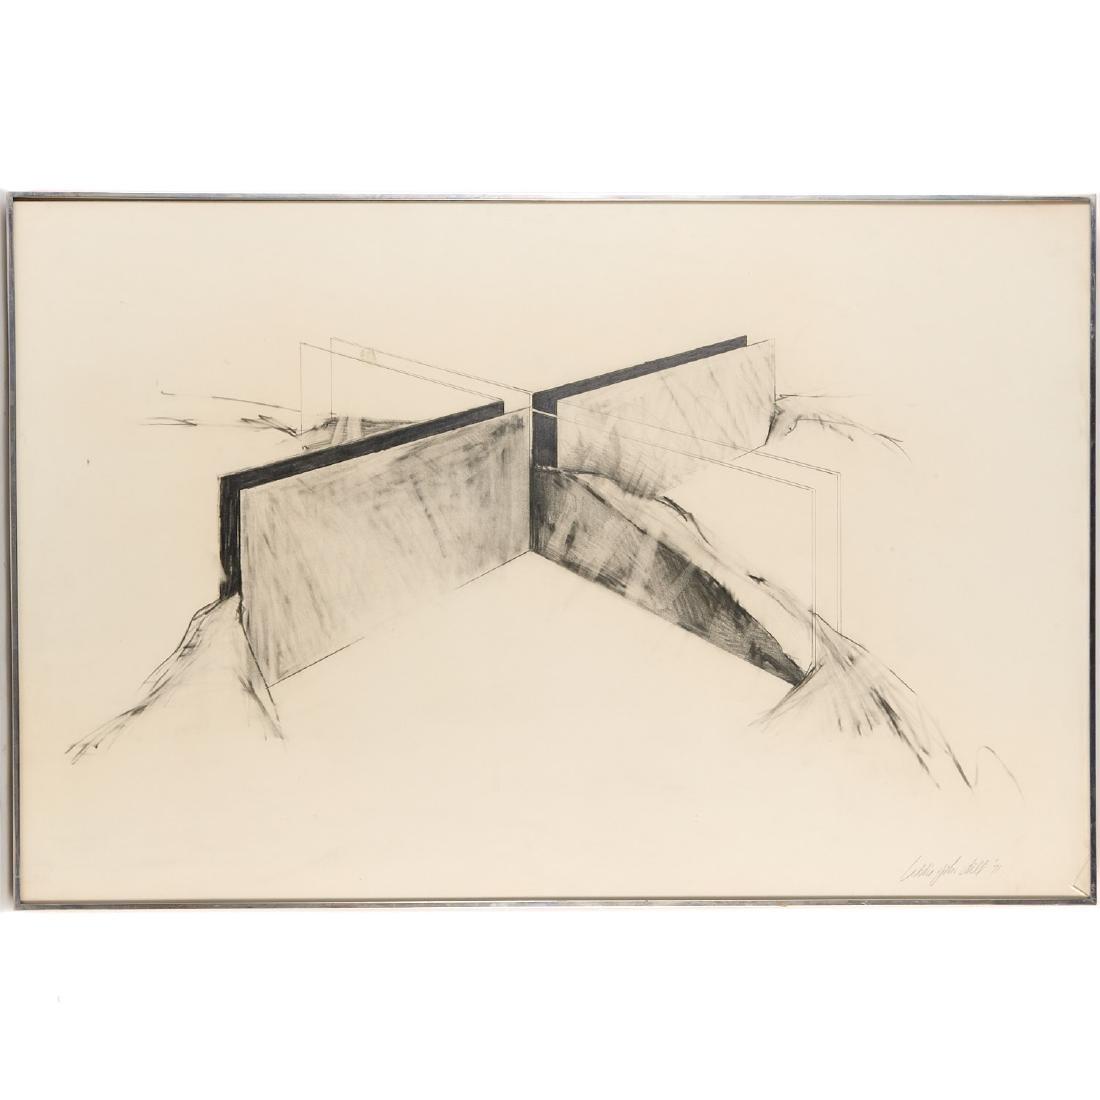 Laddie John Dill, drawing